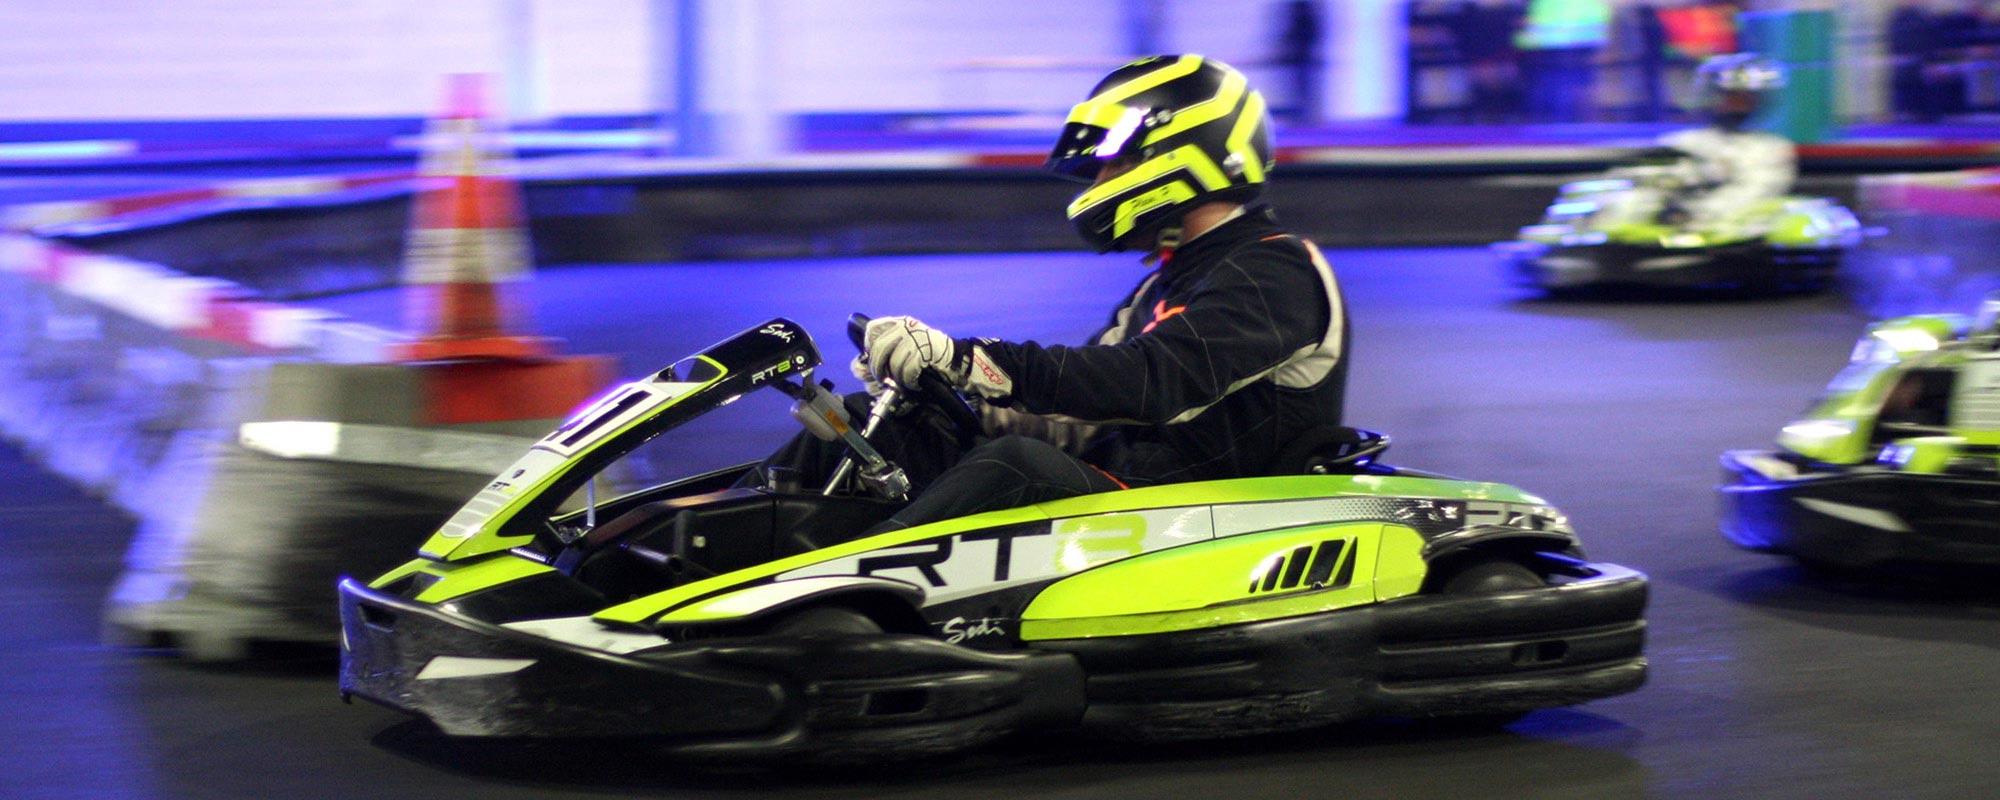 ebafkc-karting-2000x800-09